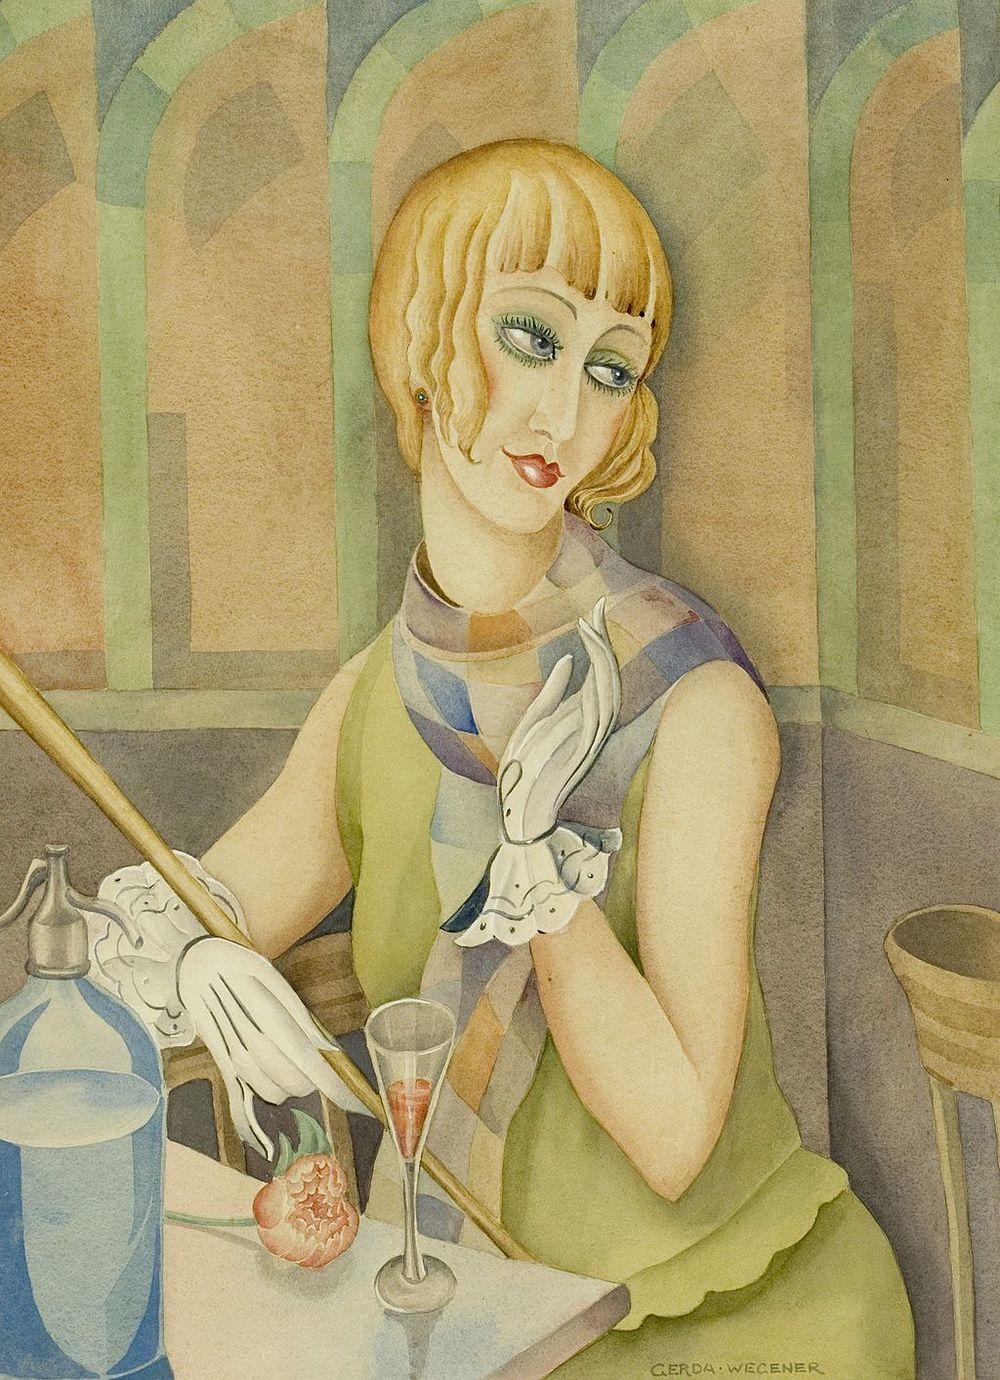 Gerda Gottlieb,Lili Elbe, 1920.wikipedia.org